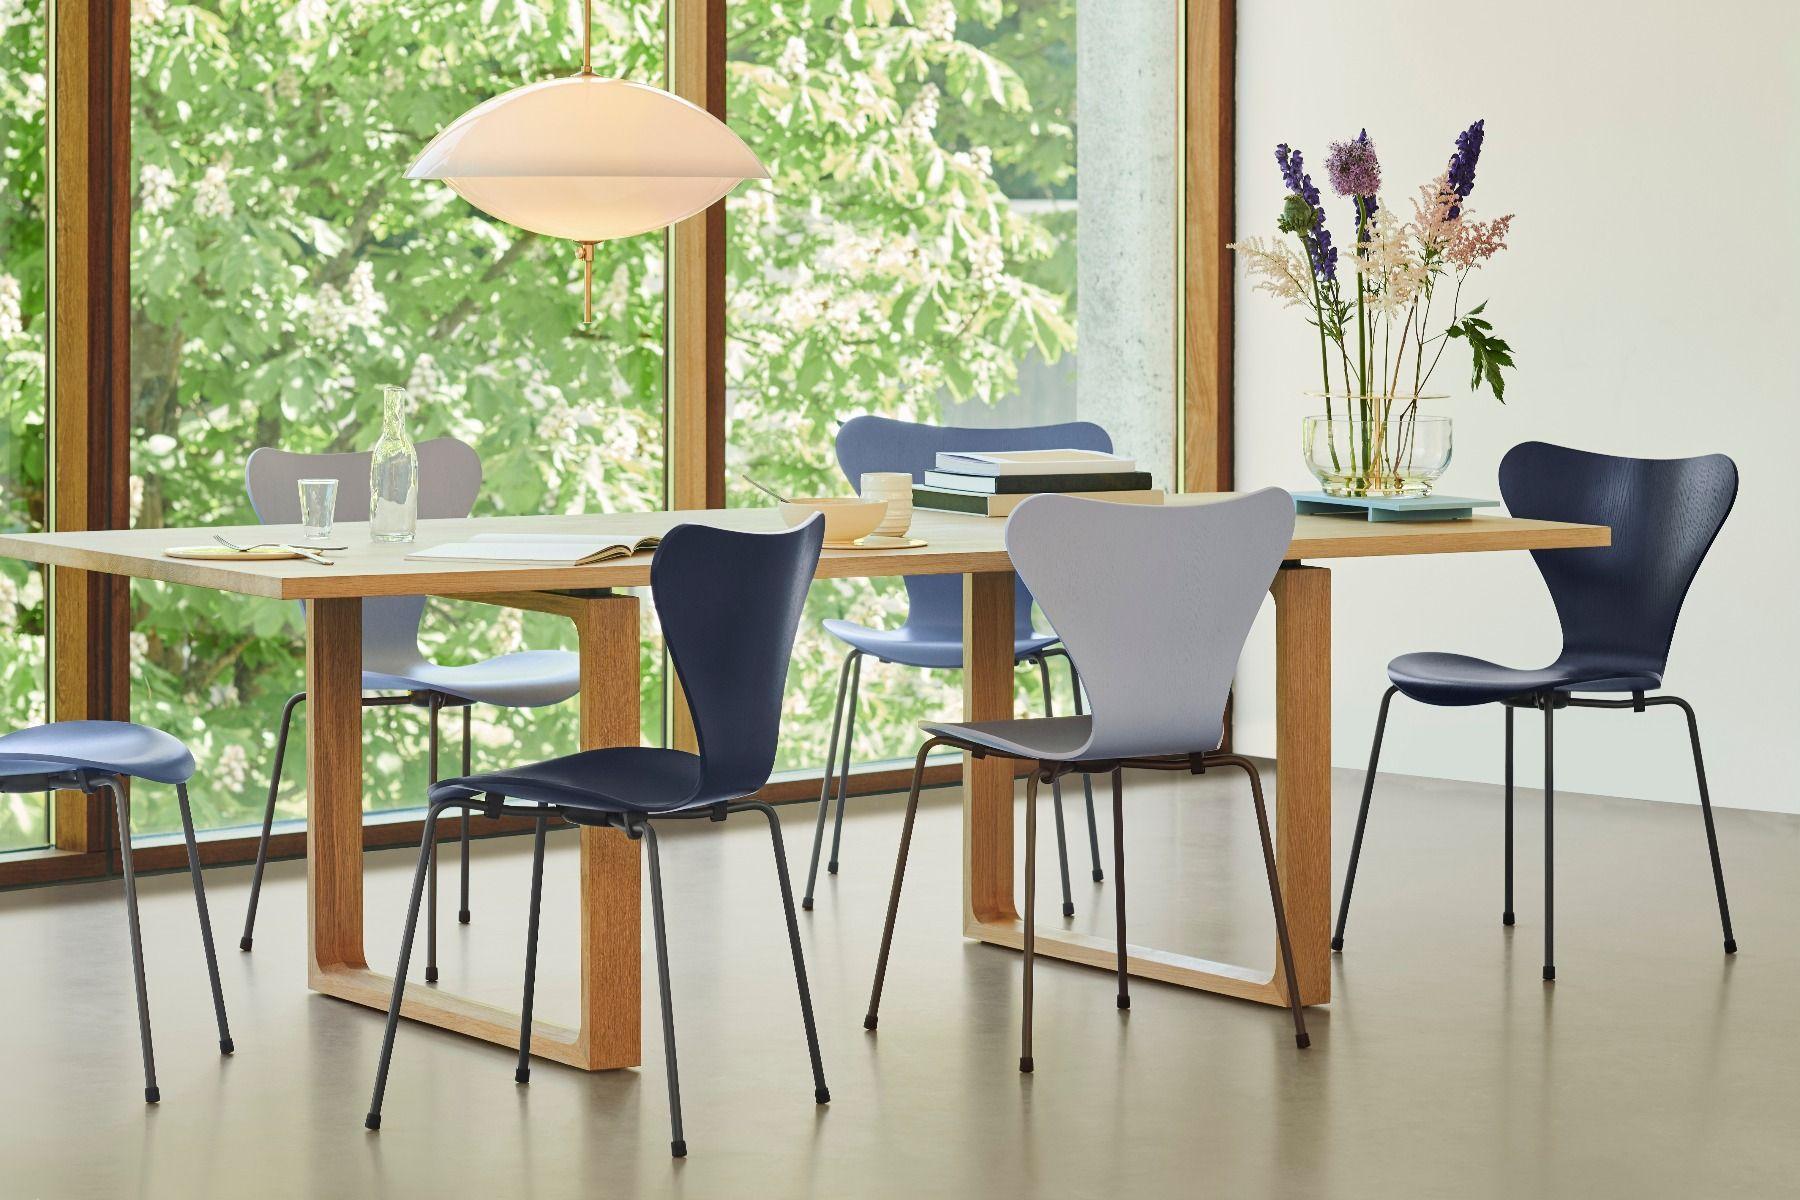 Fritz Hansen Series 7 Chair - Coloured Ash in grey blue colour scheme